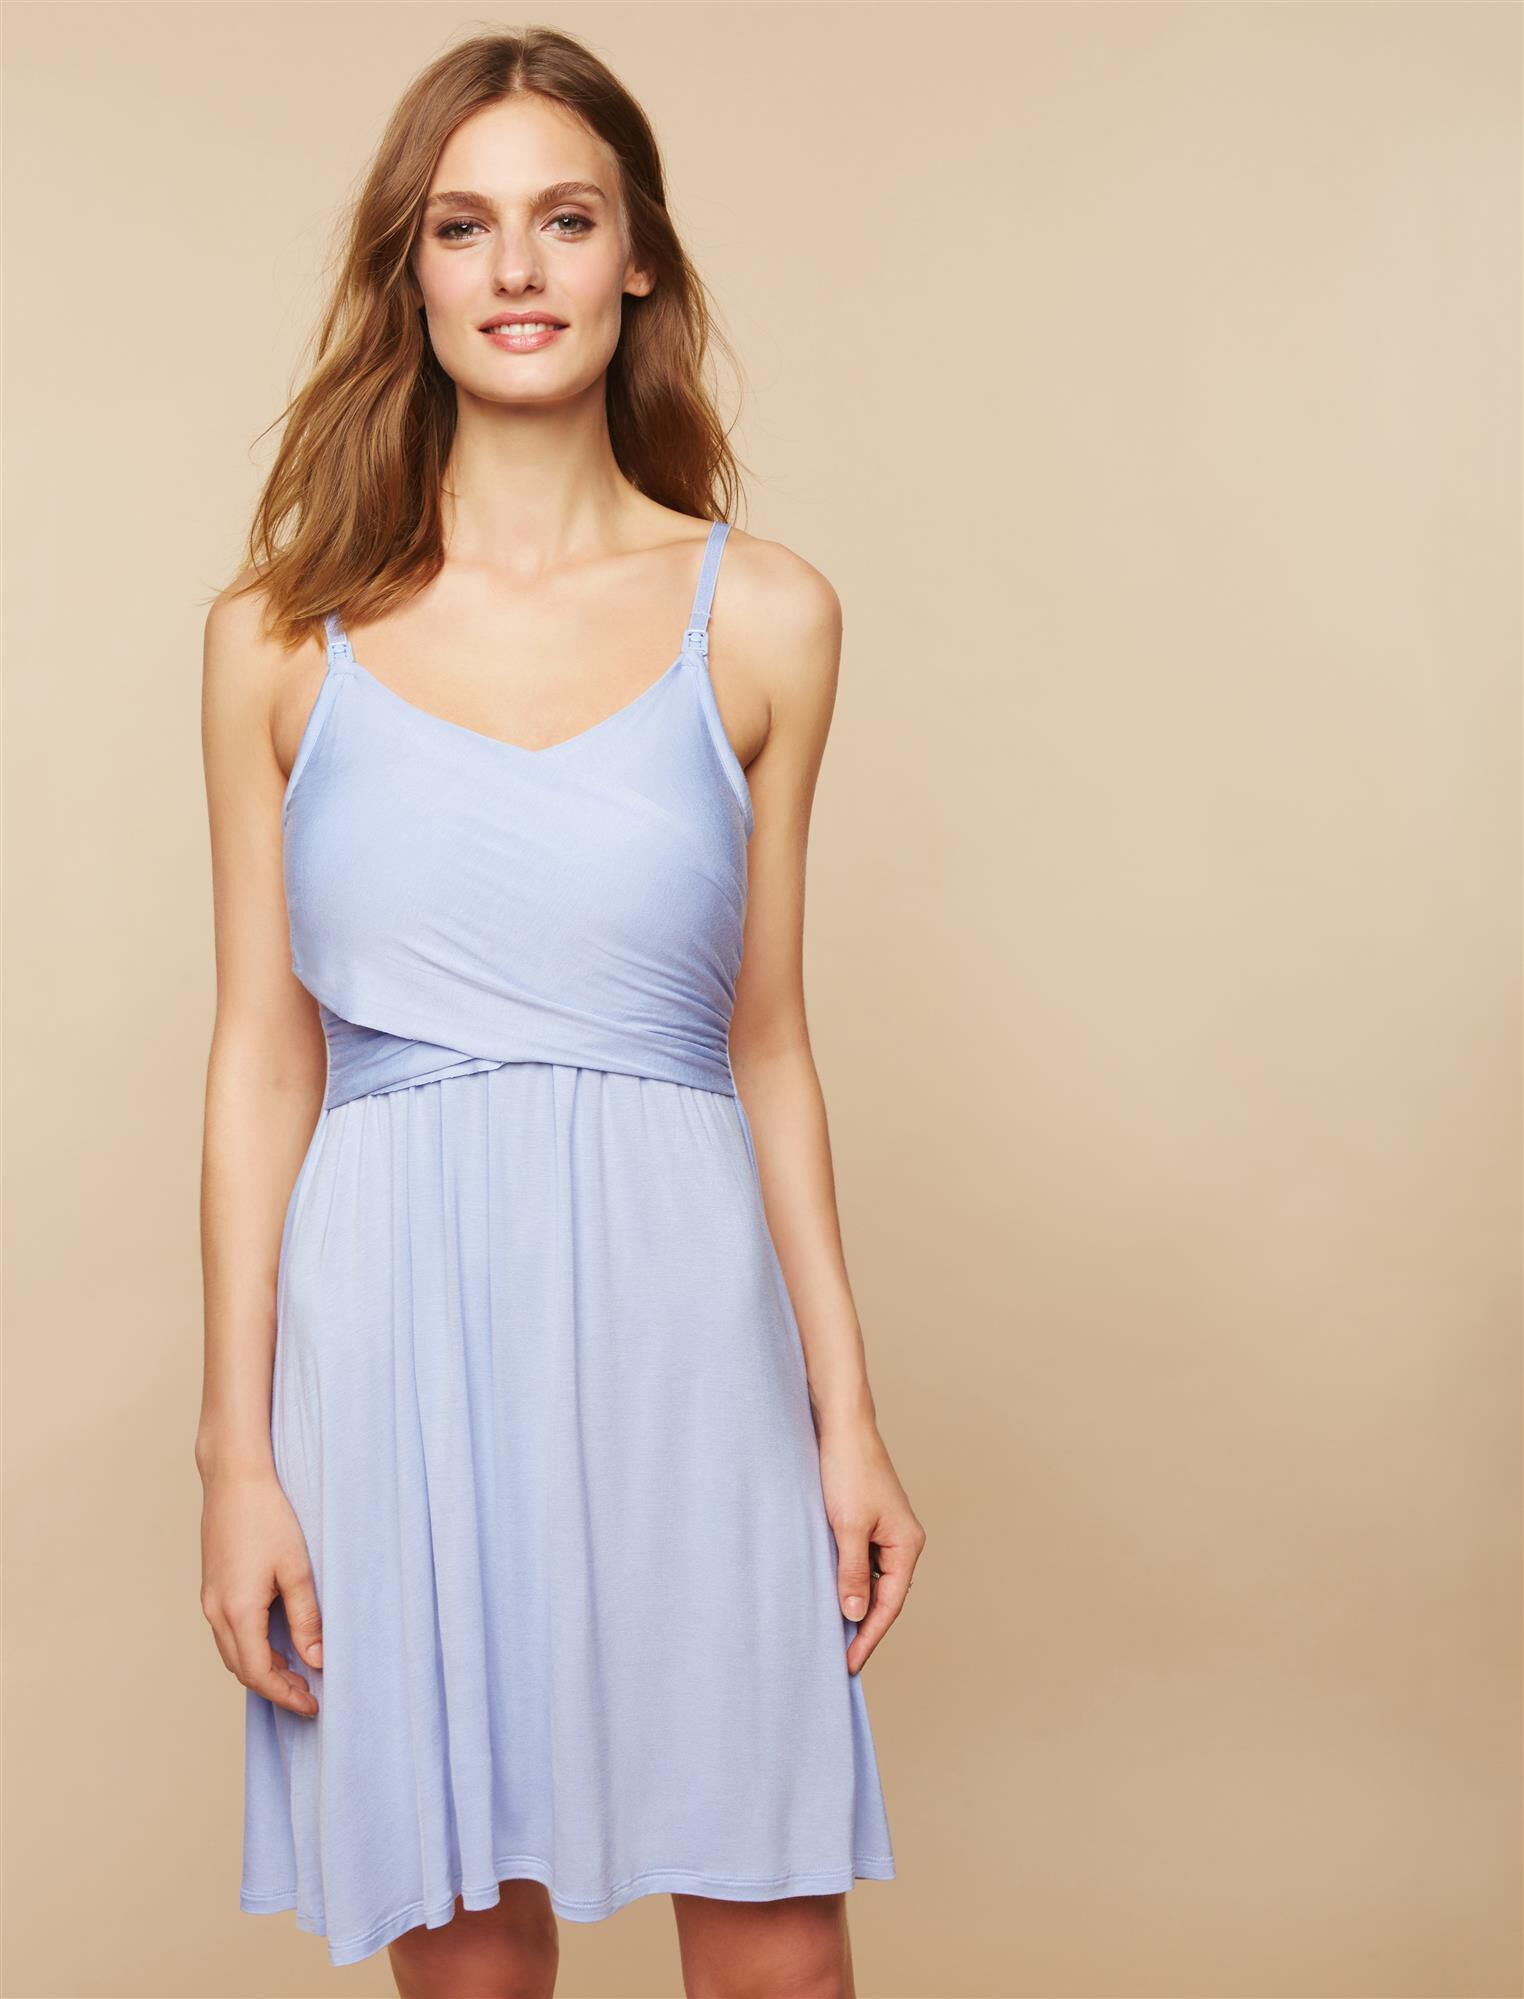 Twist Front Clip Down Nursing Nightgown- Solid